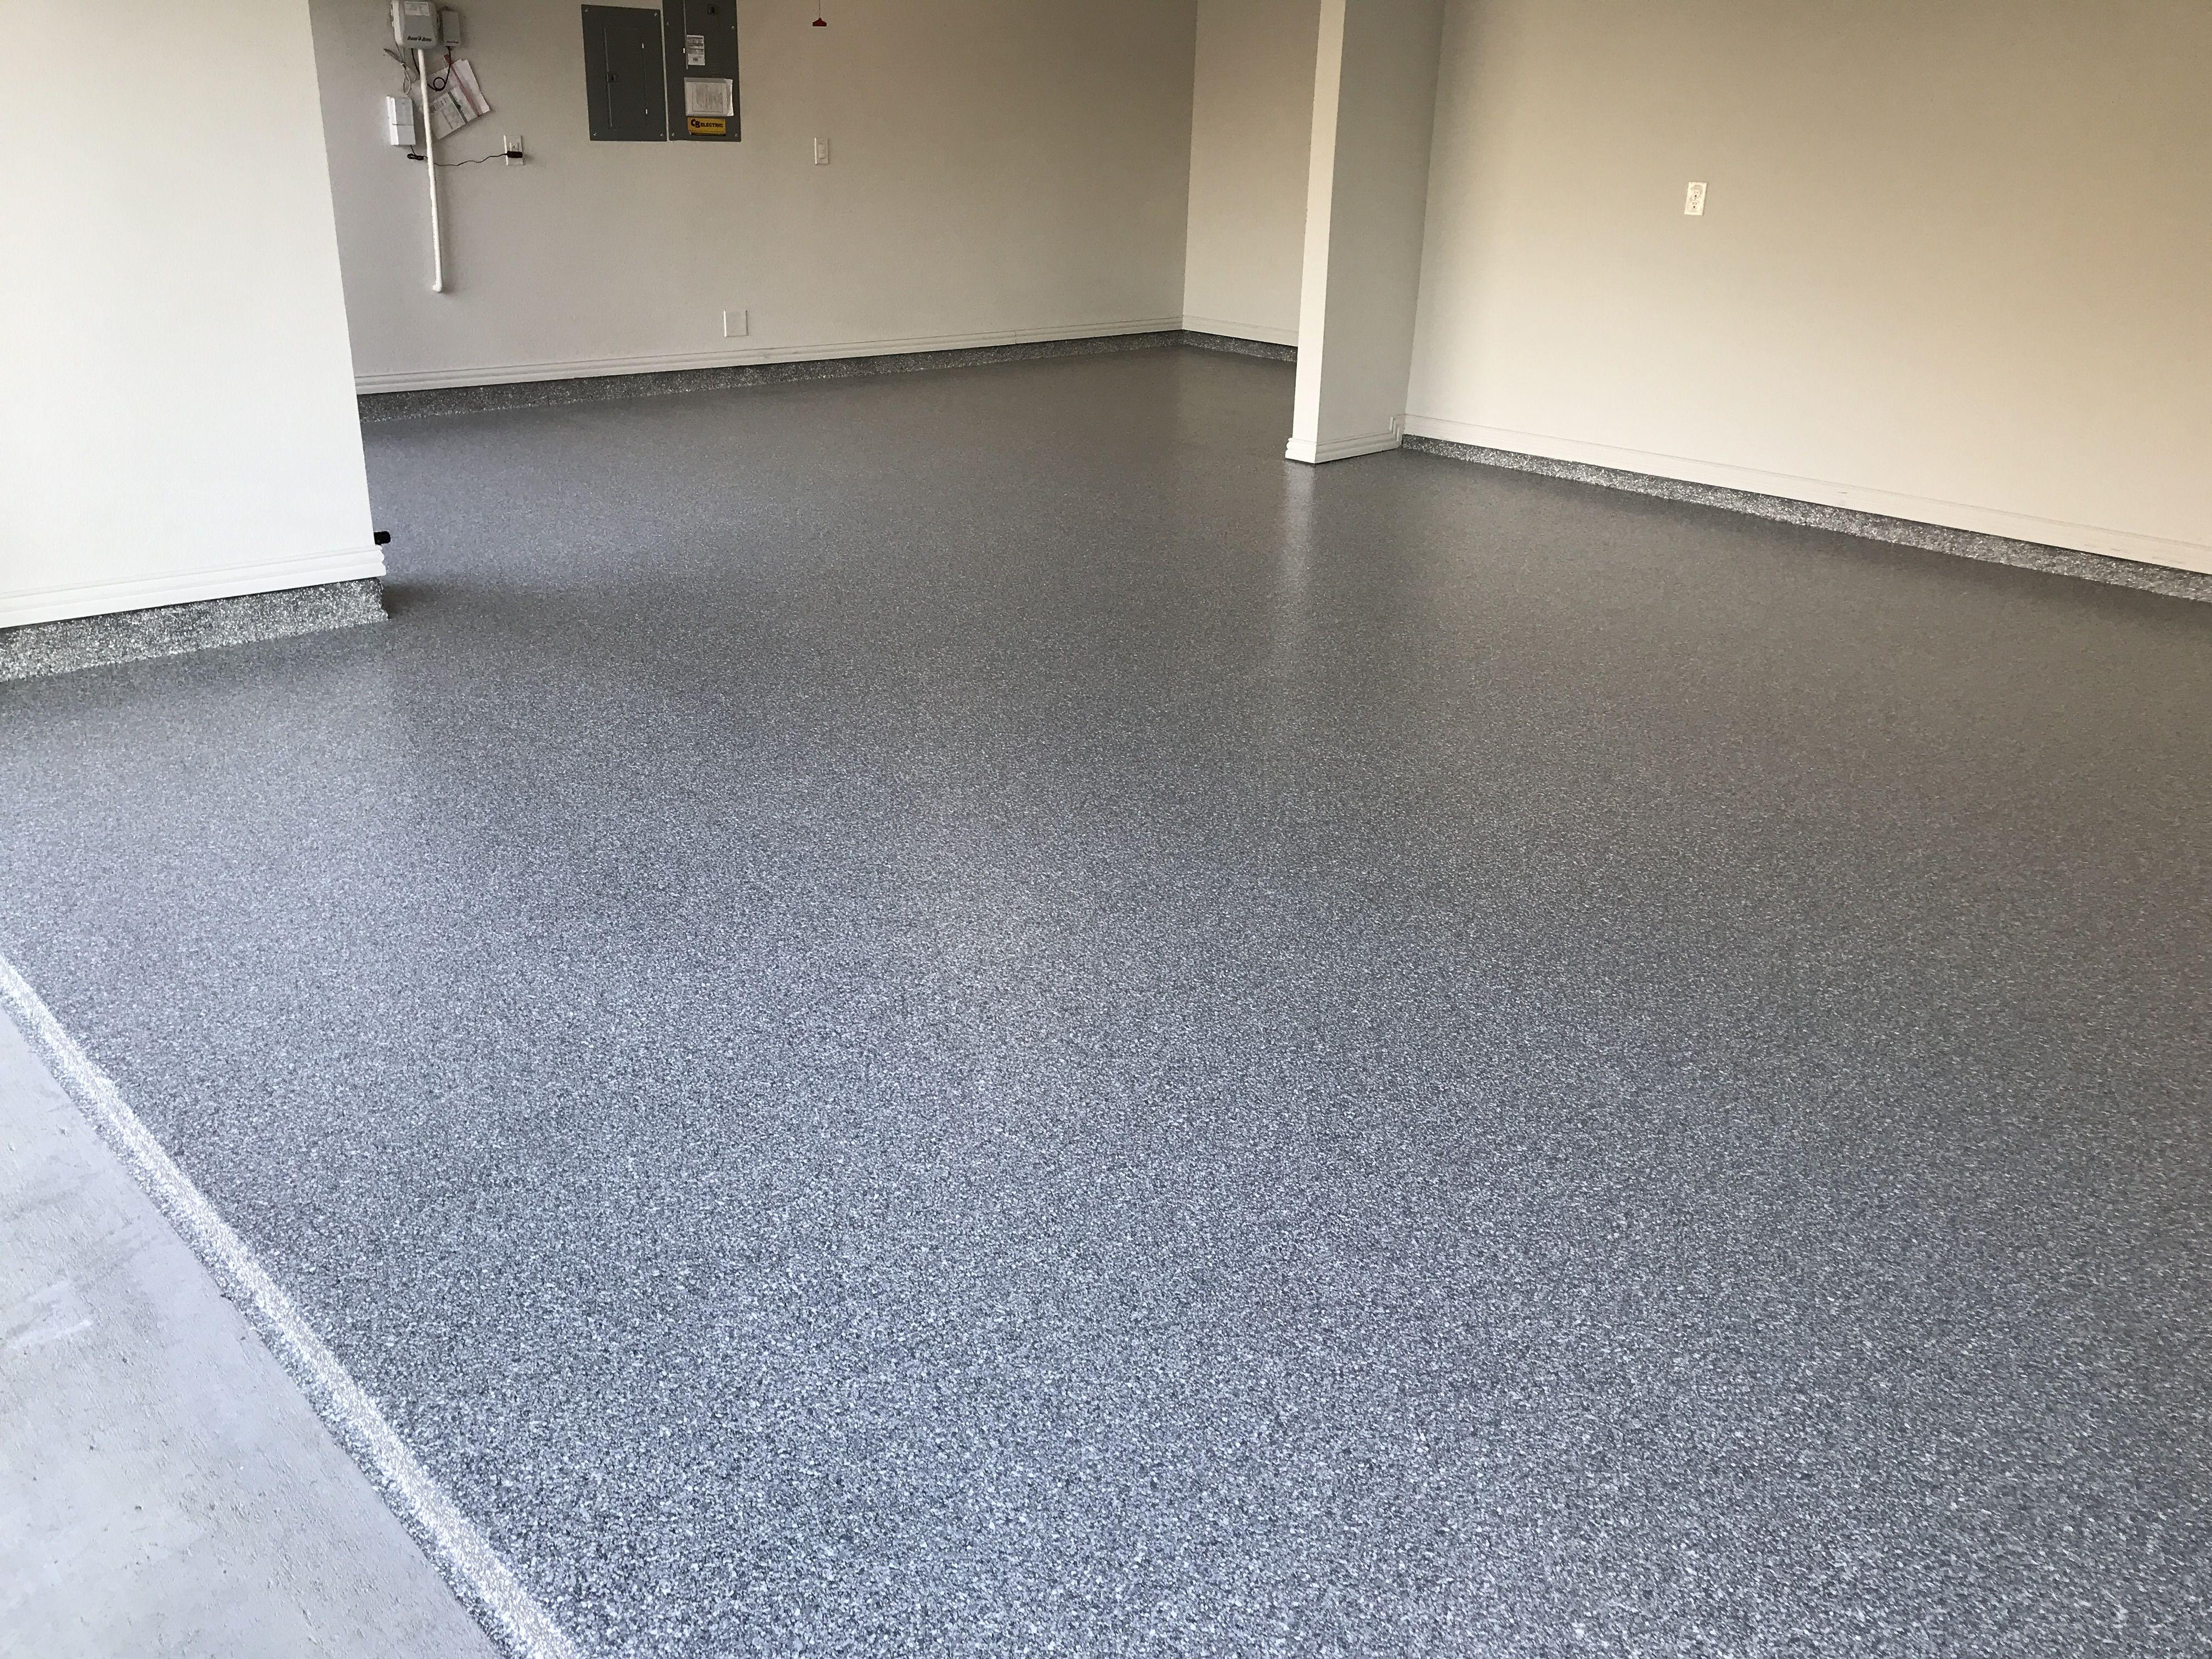 Classic Moonstone Polyaspartic Epoxy Garage Floor Epoxy Garage Floor Coating Garage Floor Coatings Flooring Contractor